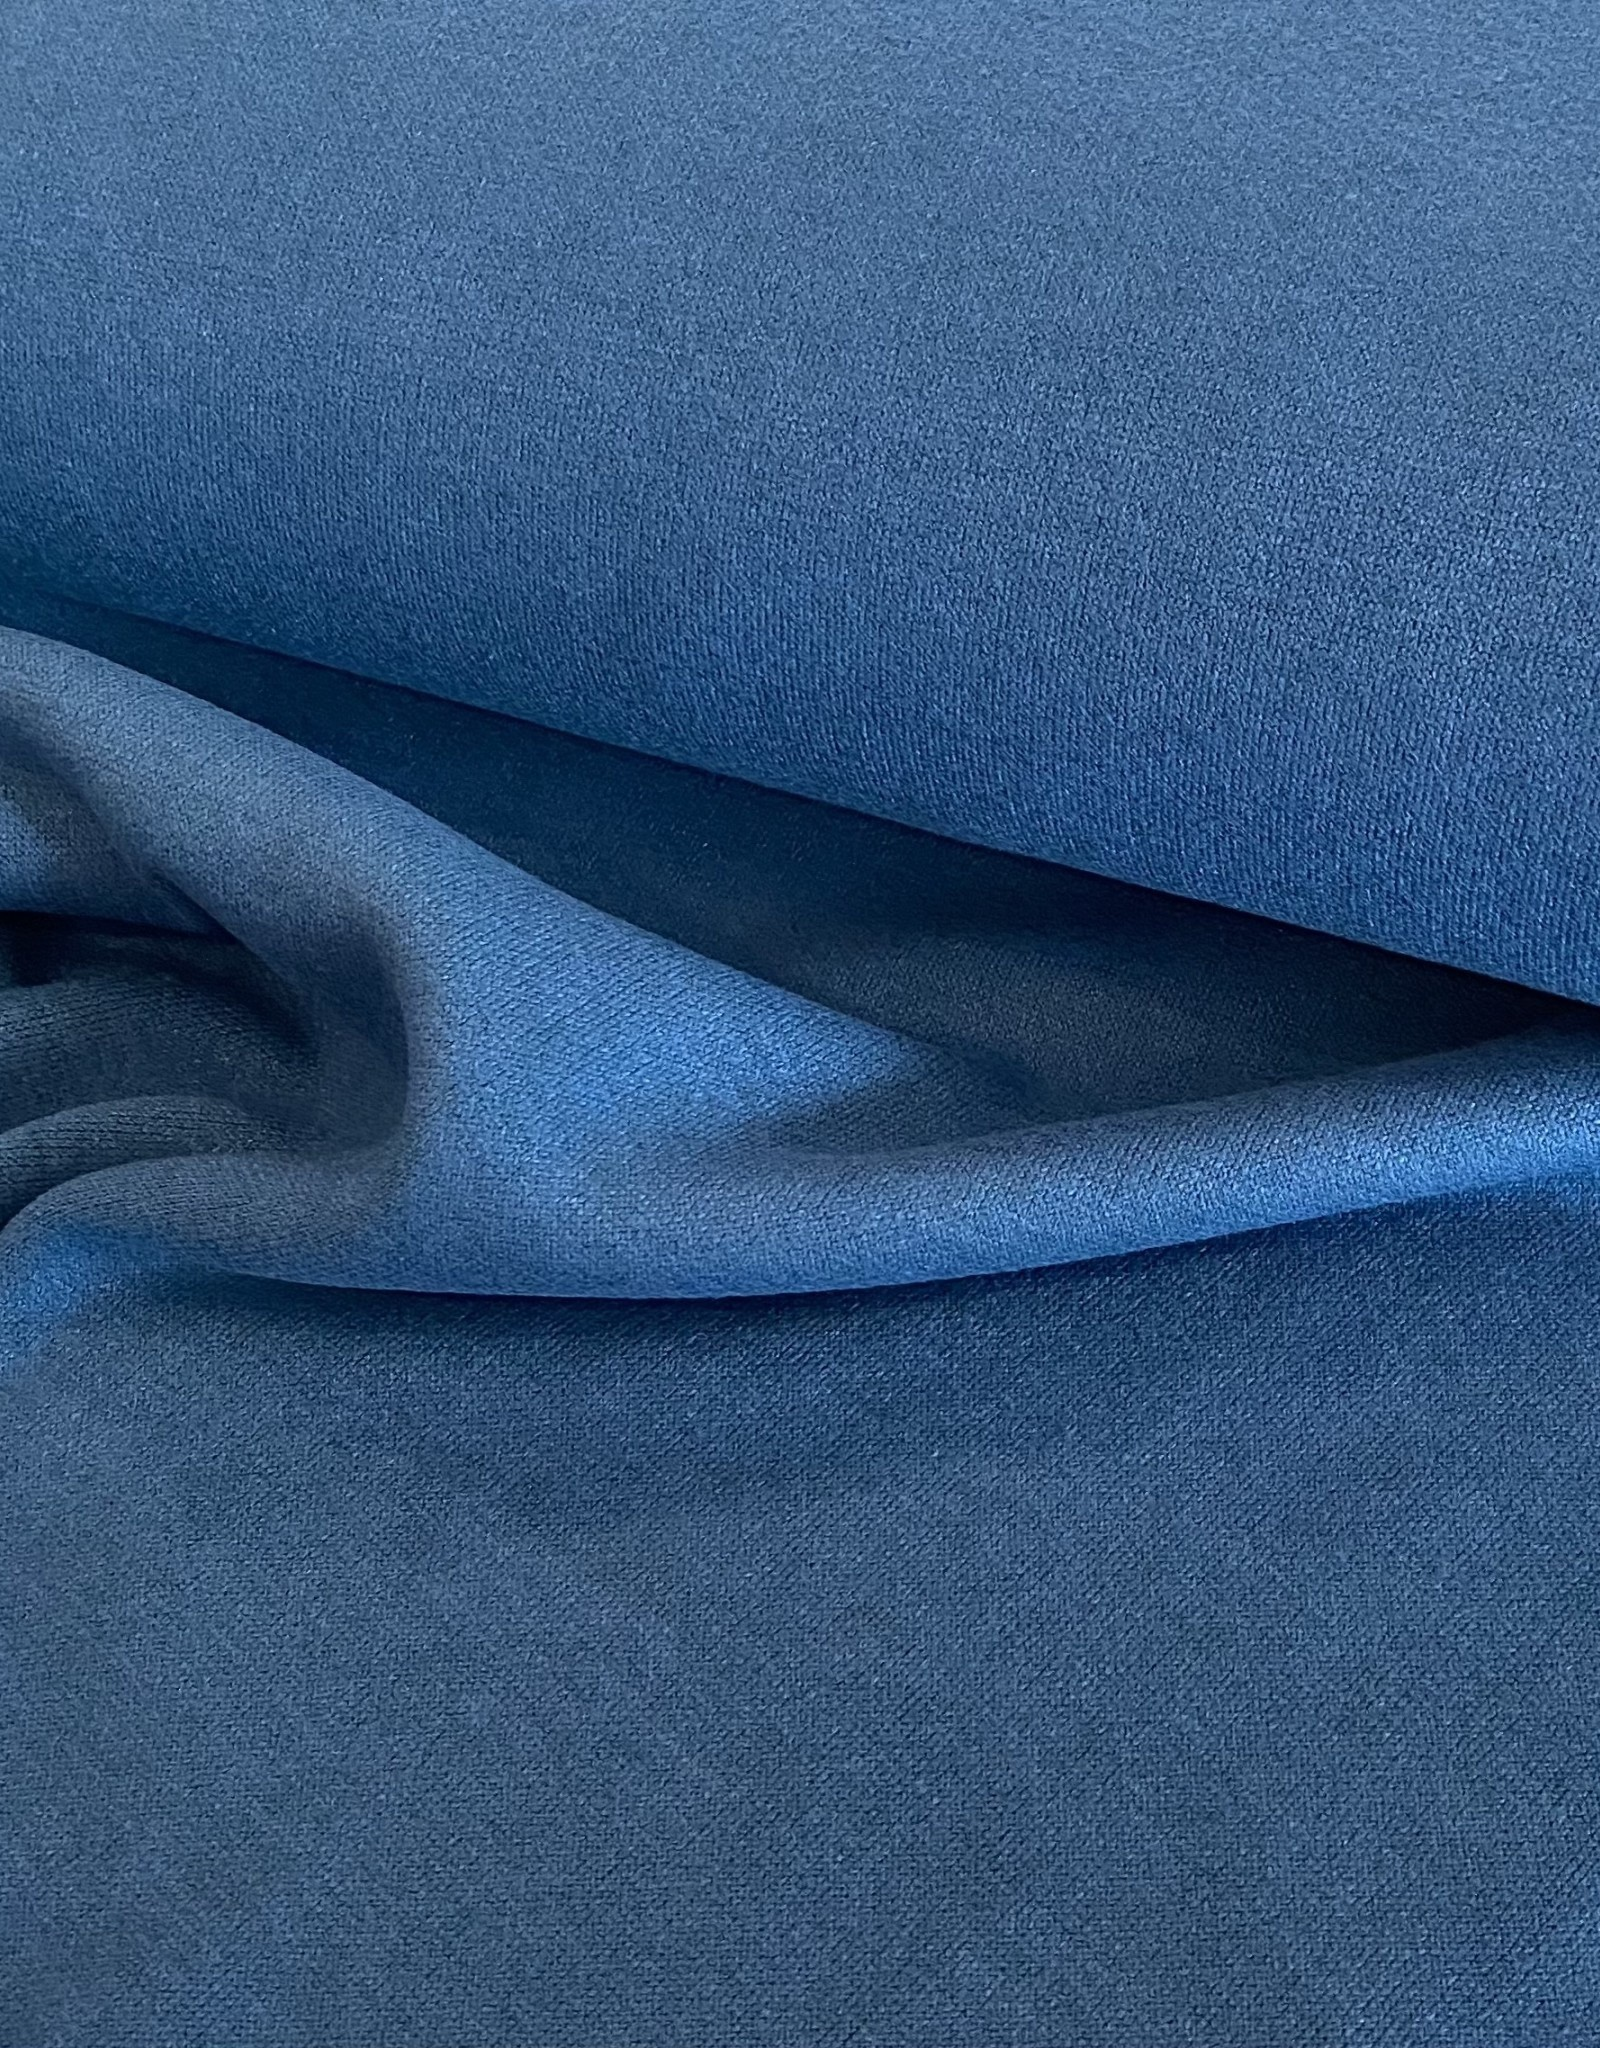 SuperSoft Breisel Melange - Turquoise